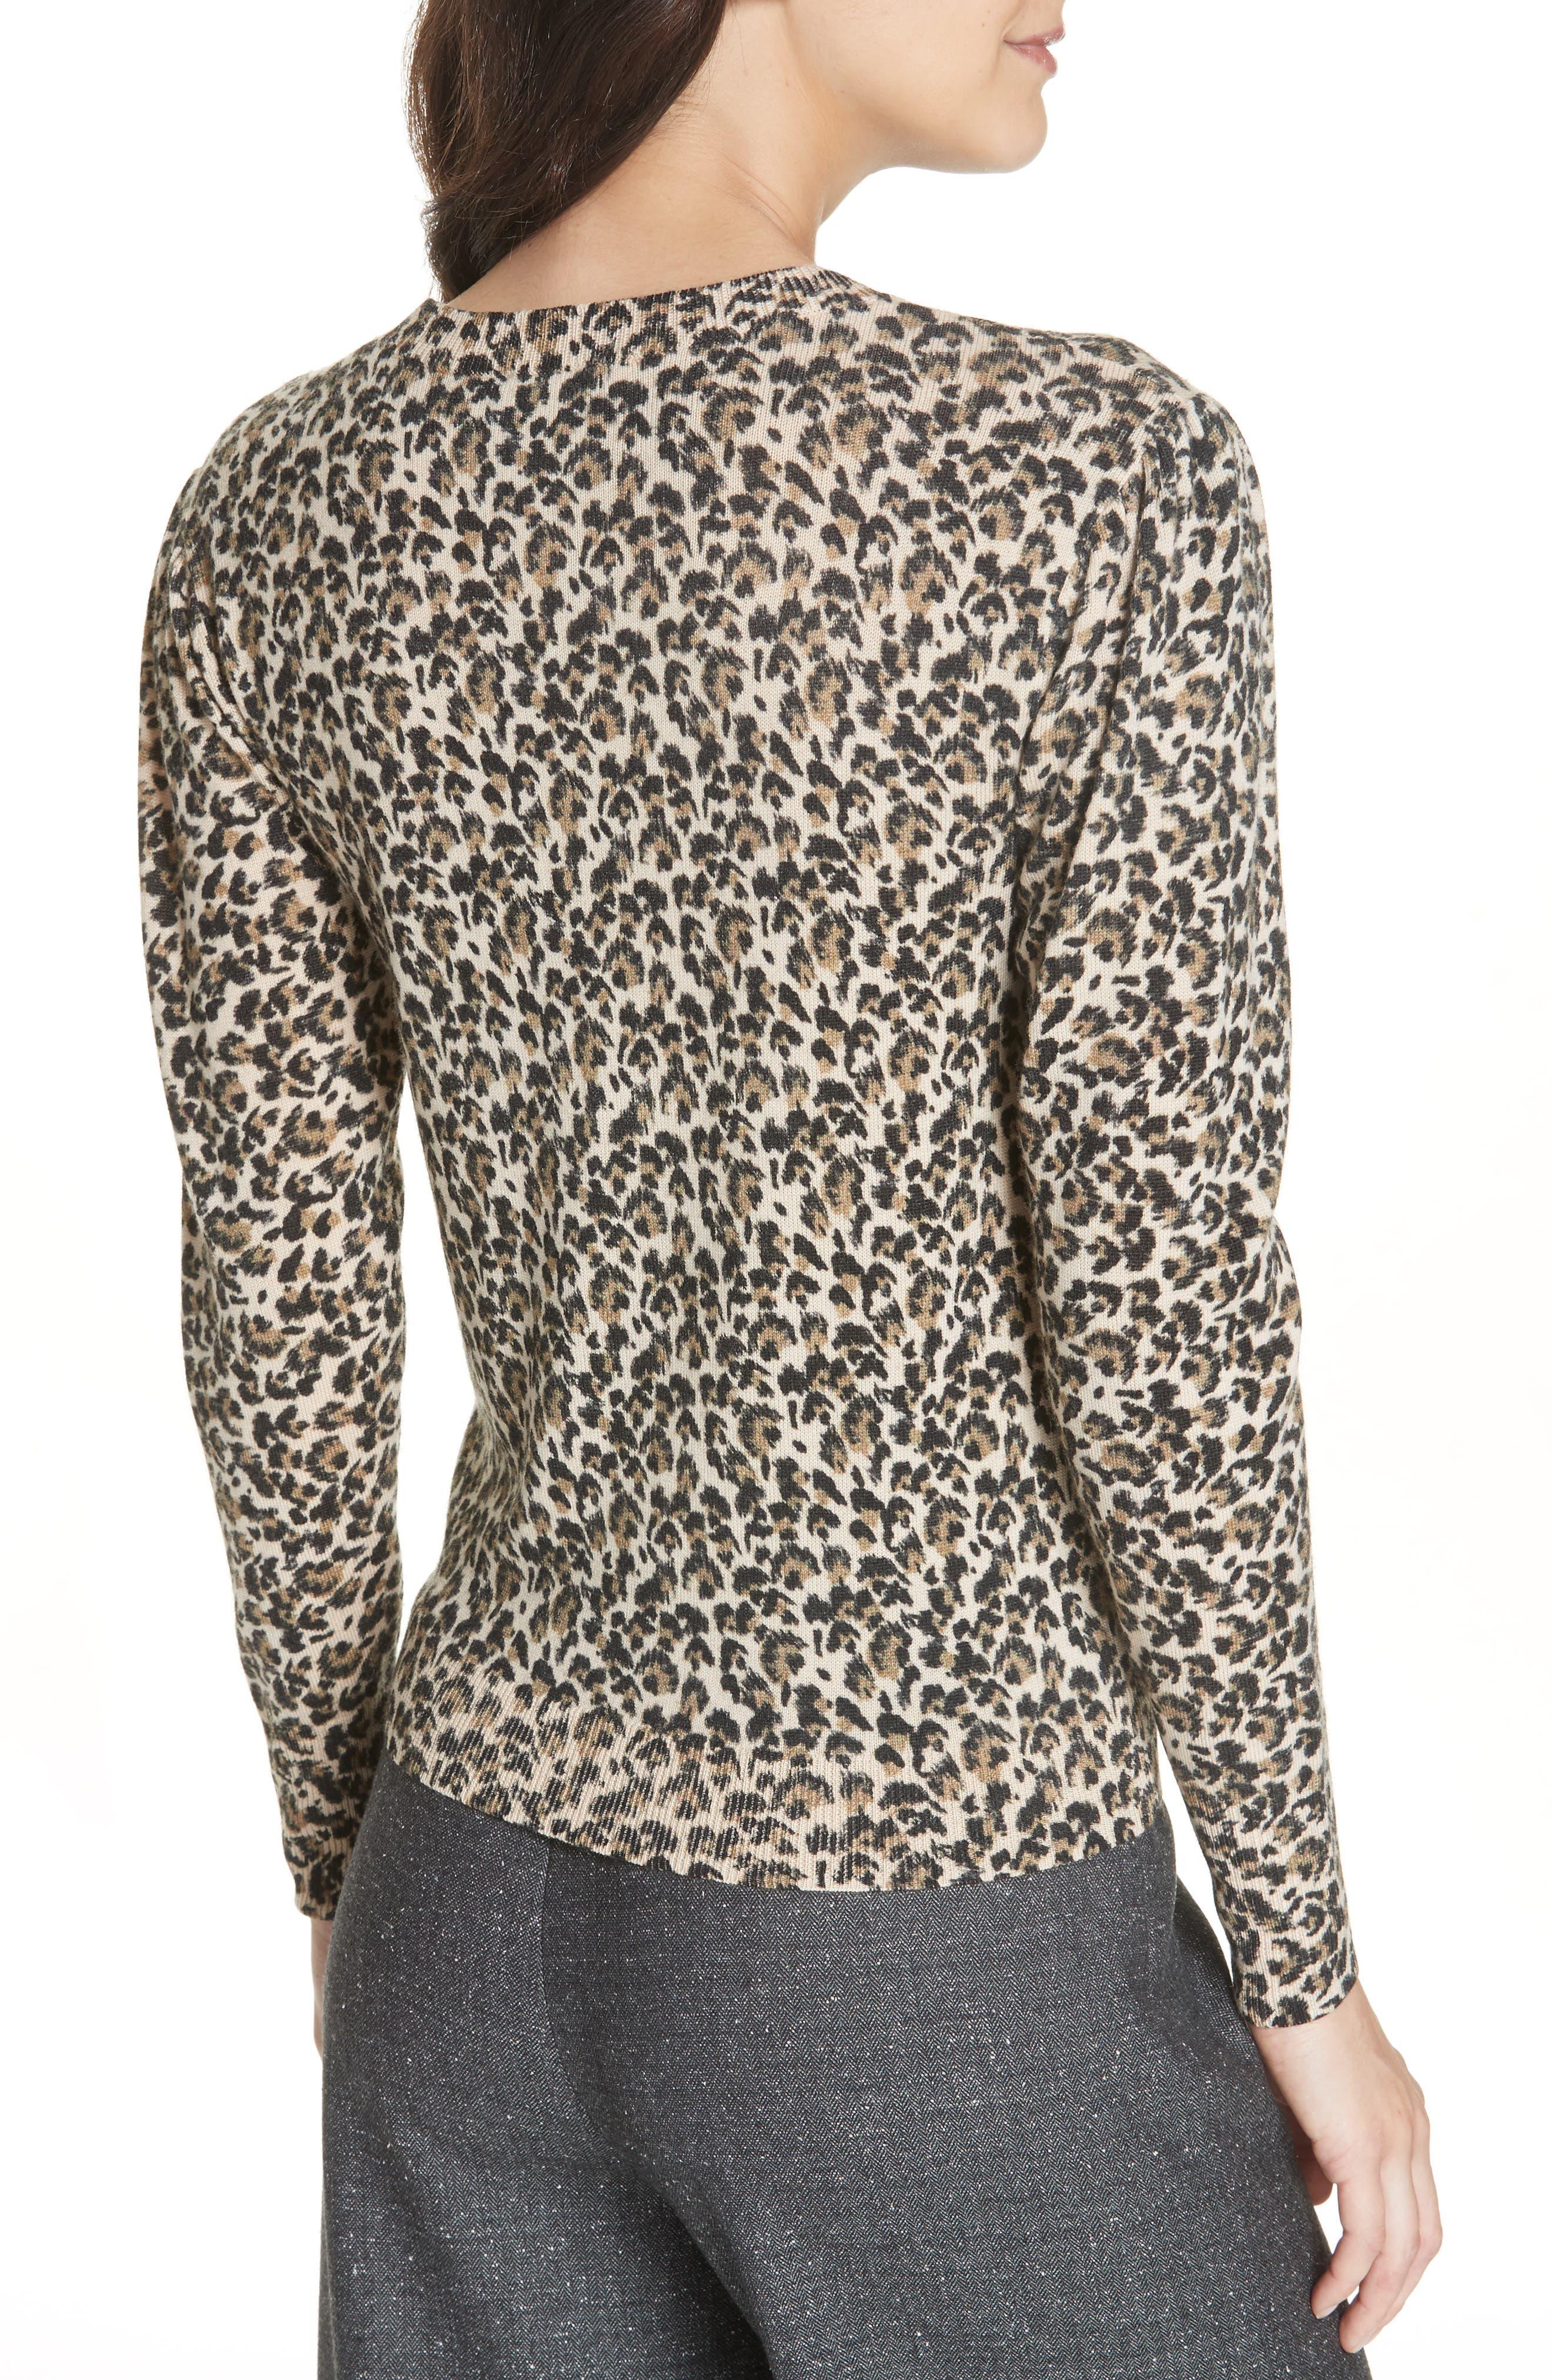 Leopard Print Wool Sweater,                             Alternate thumbnail 2, color,                             250